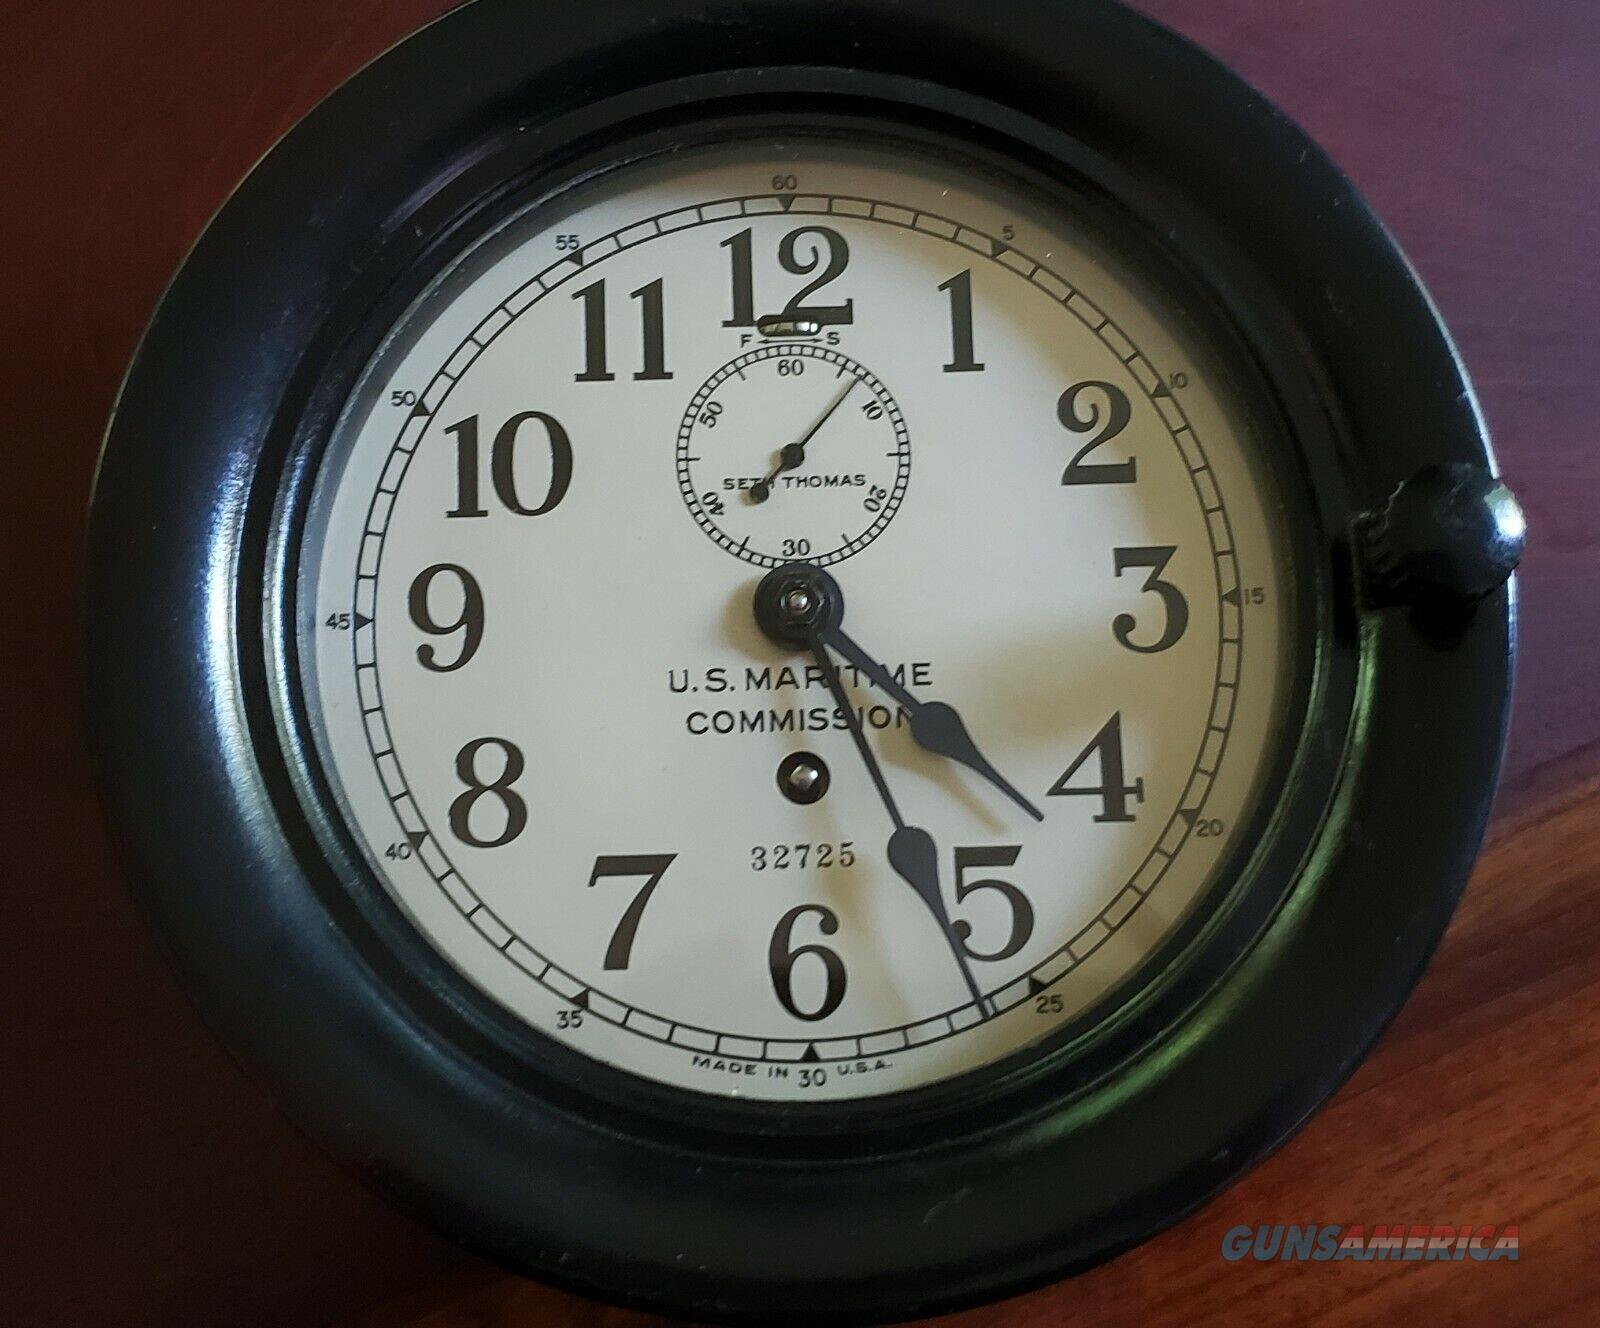 Seth Thomas WWII U.S. Maritime Commission Clock  Non-Guns > Military > Memorabilia